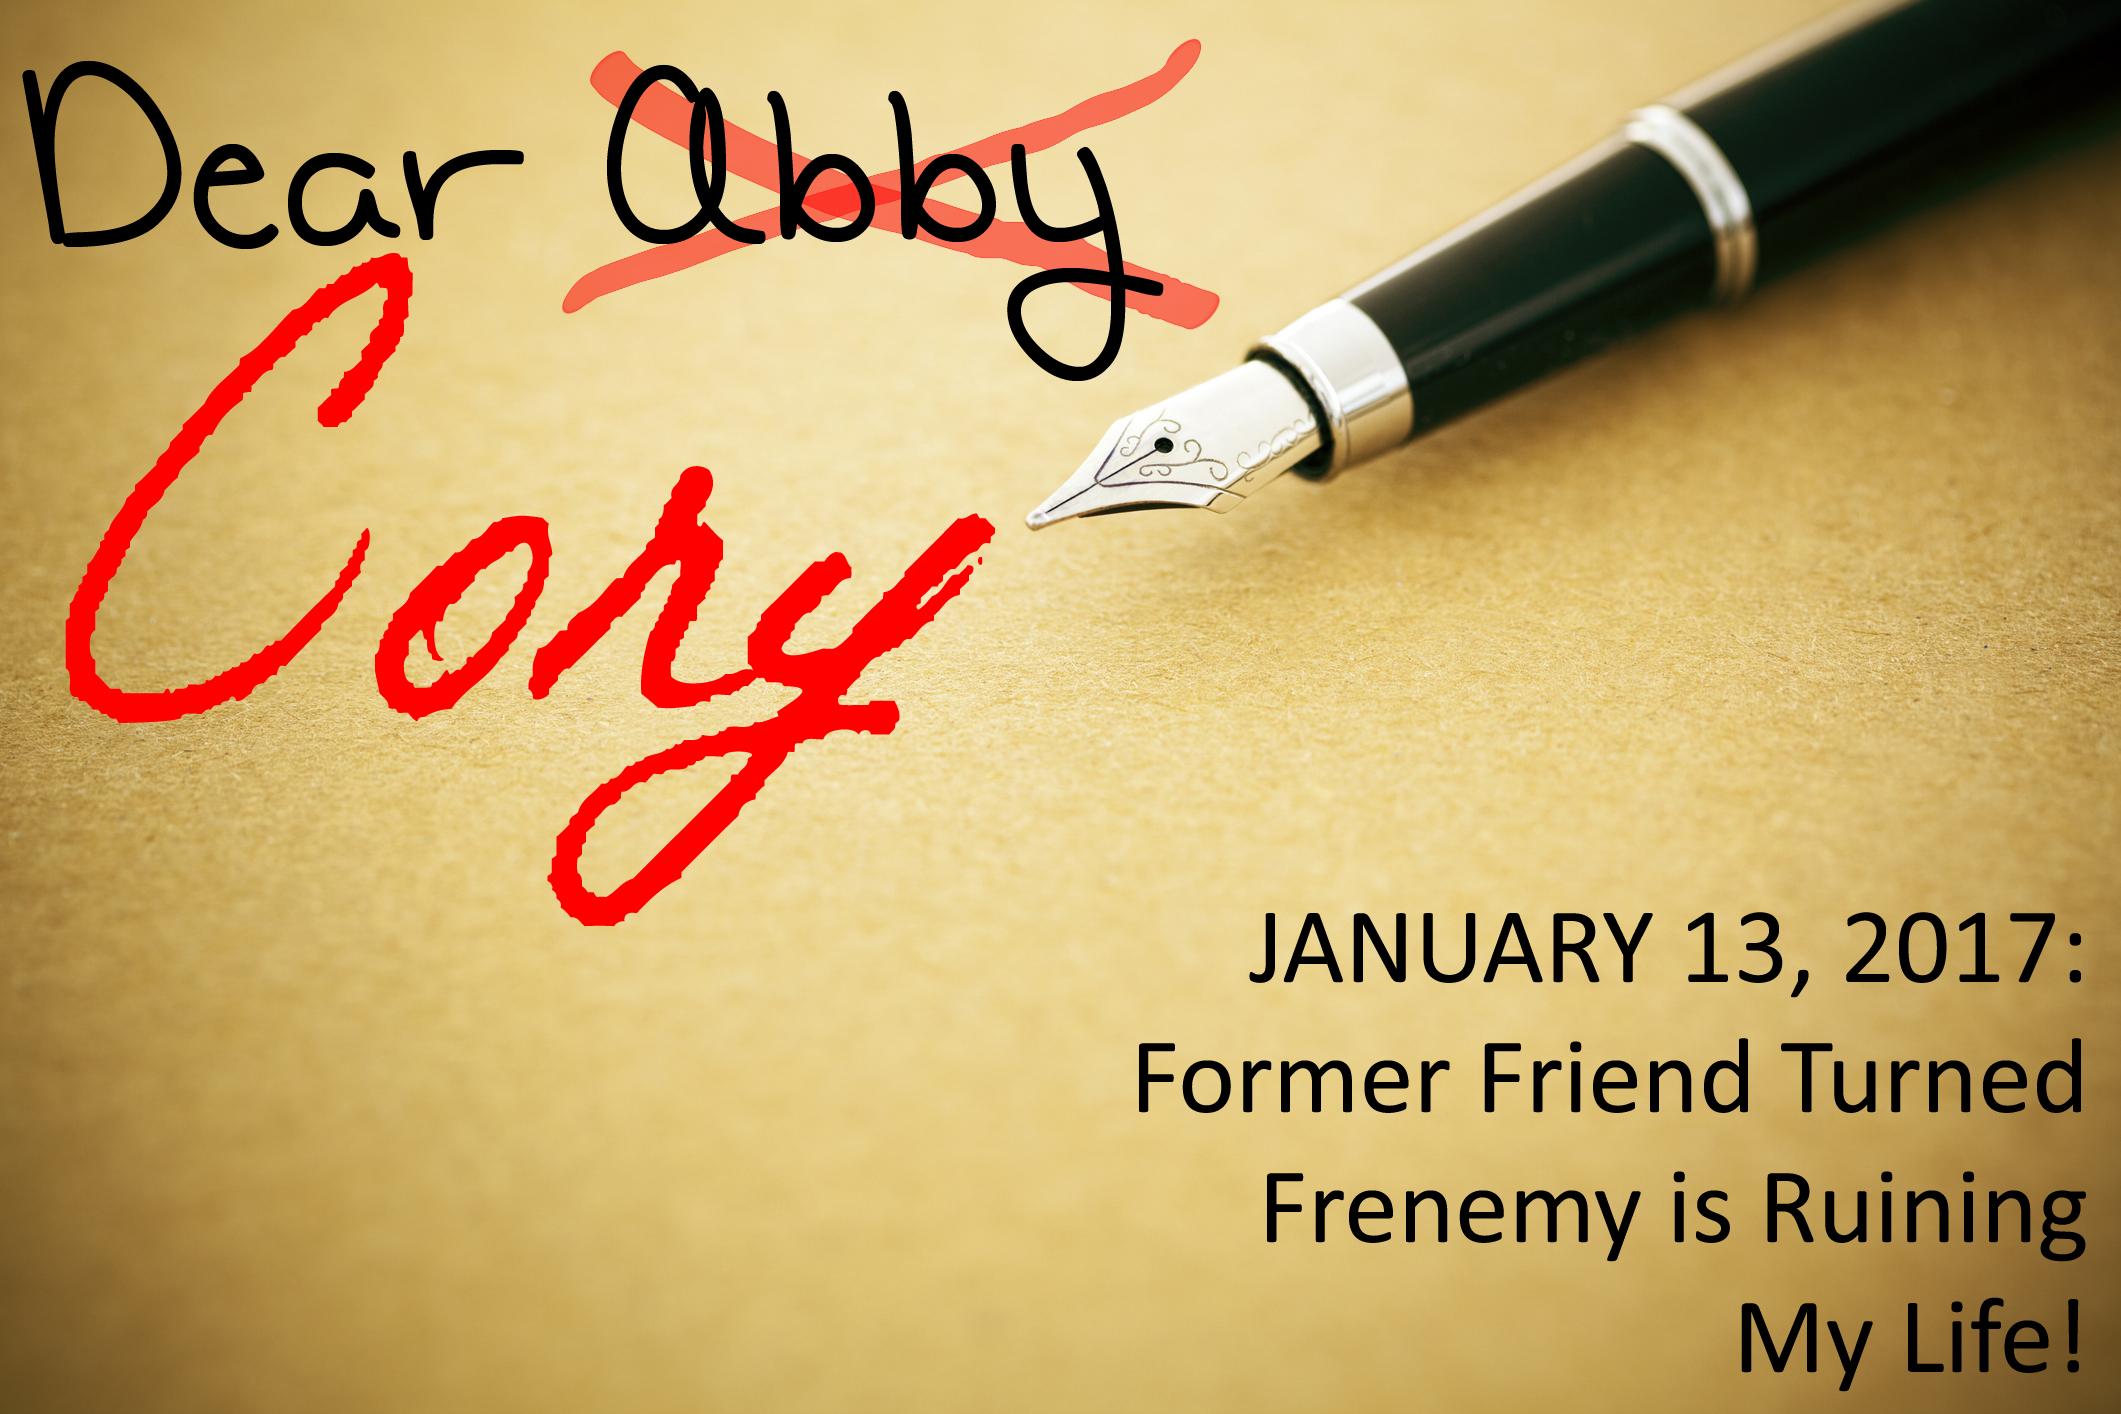 Dear Cory: Former Friend Turned Frenemy is Ruining My Life! - Manifestation Machine